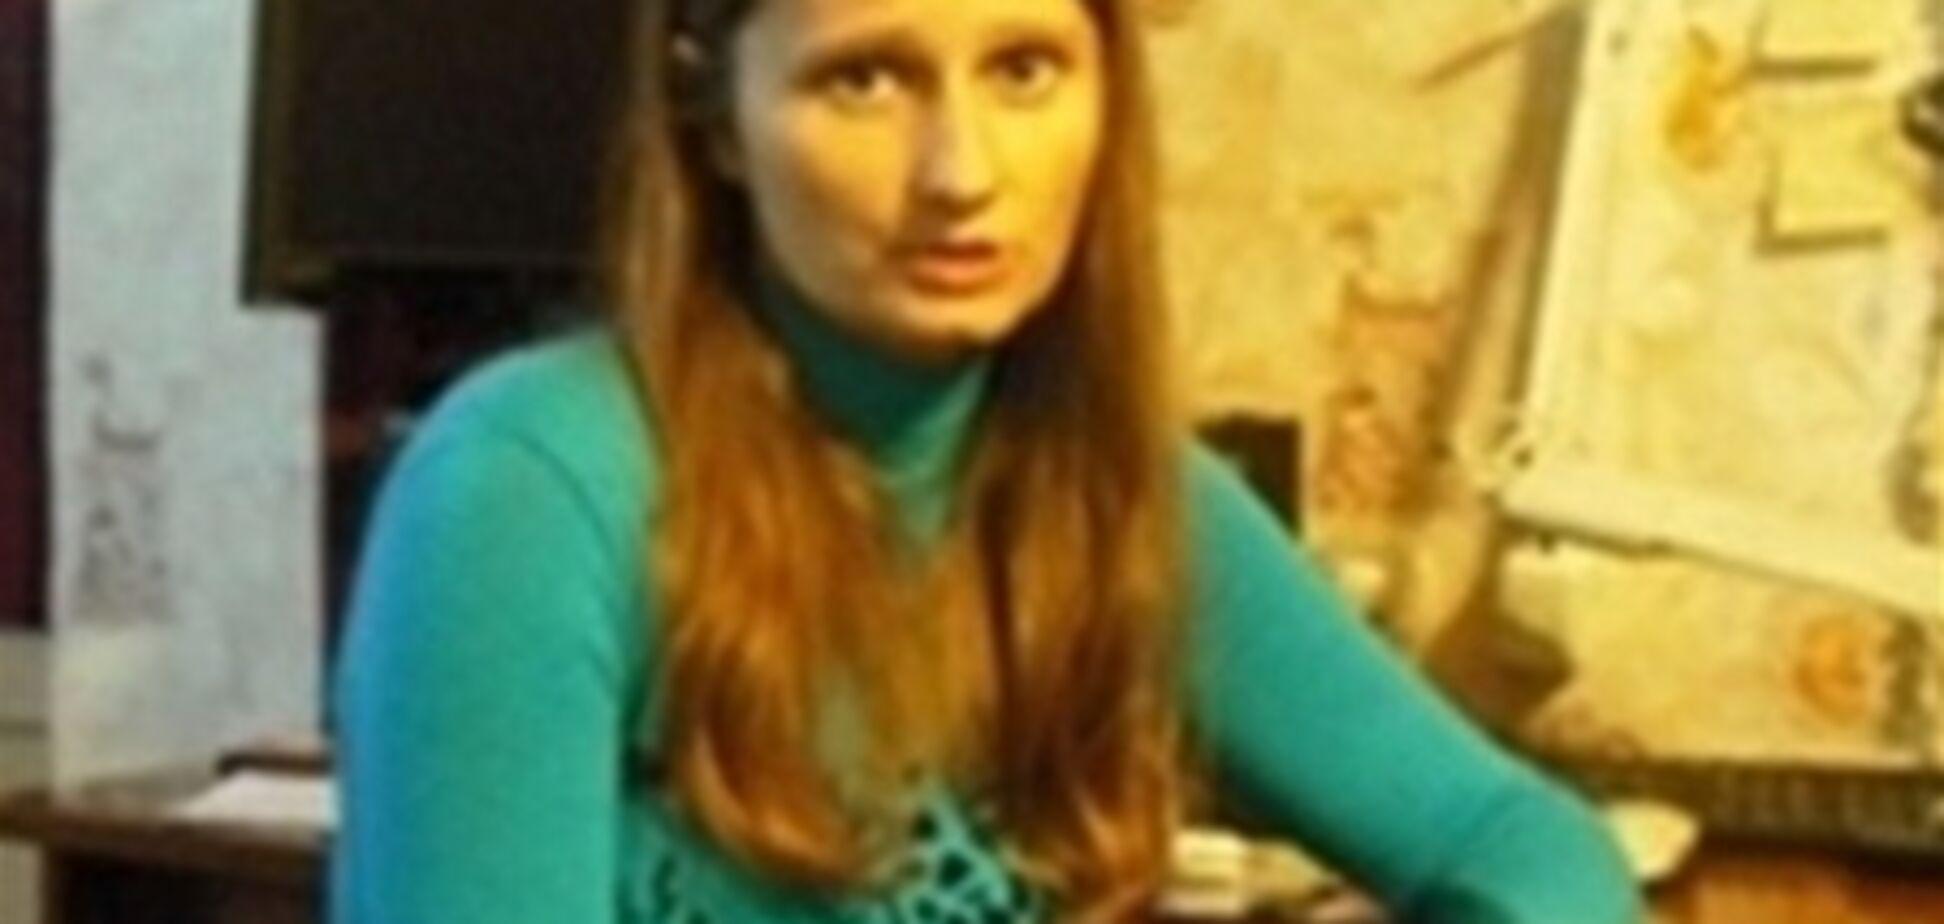 Жена Мазурка разрыдалась во время опознания тела